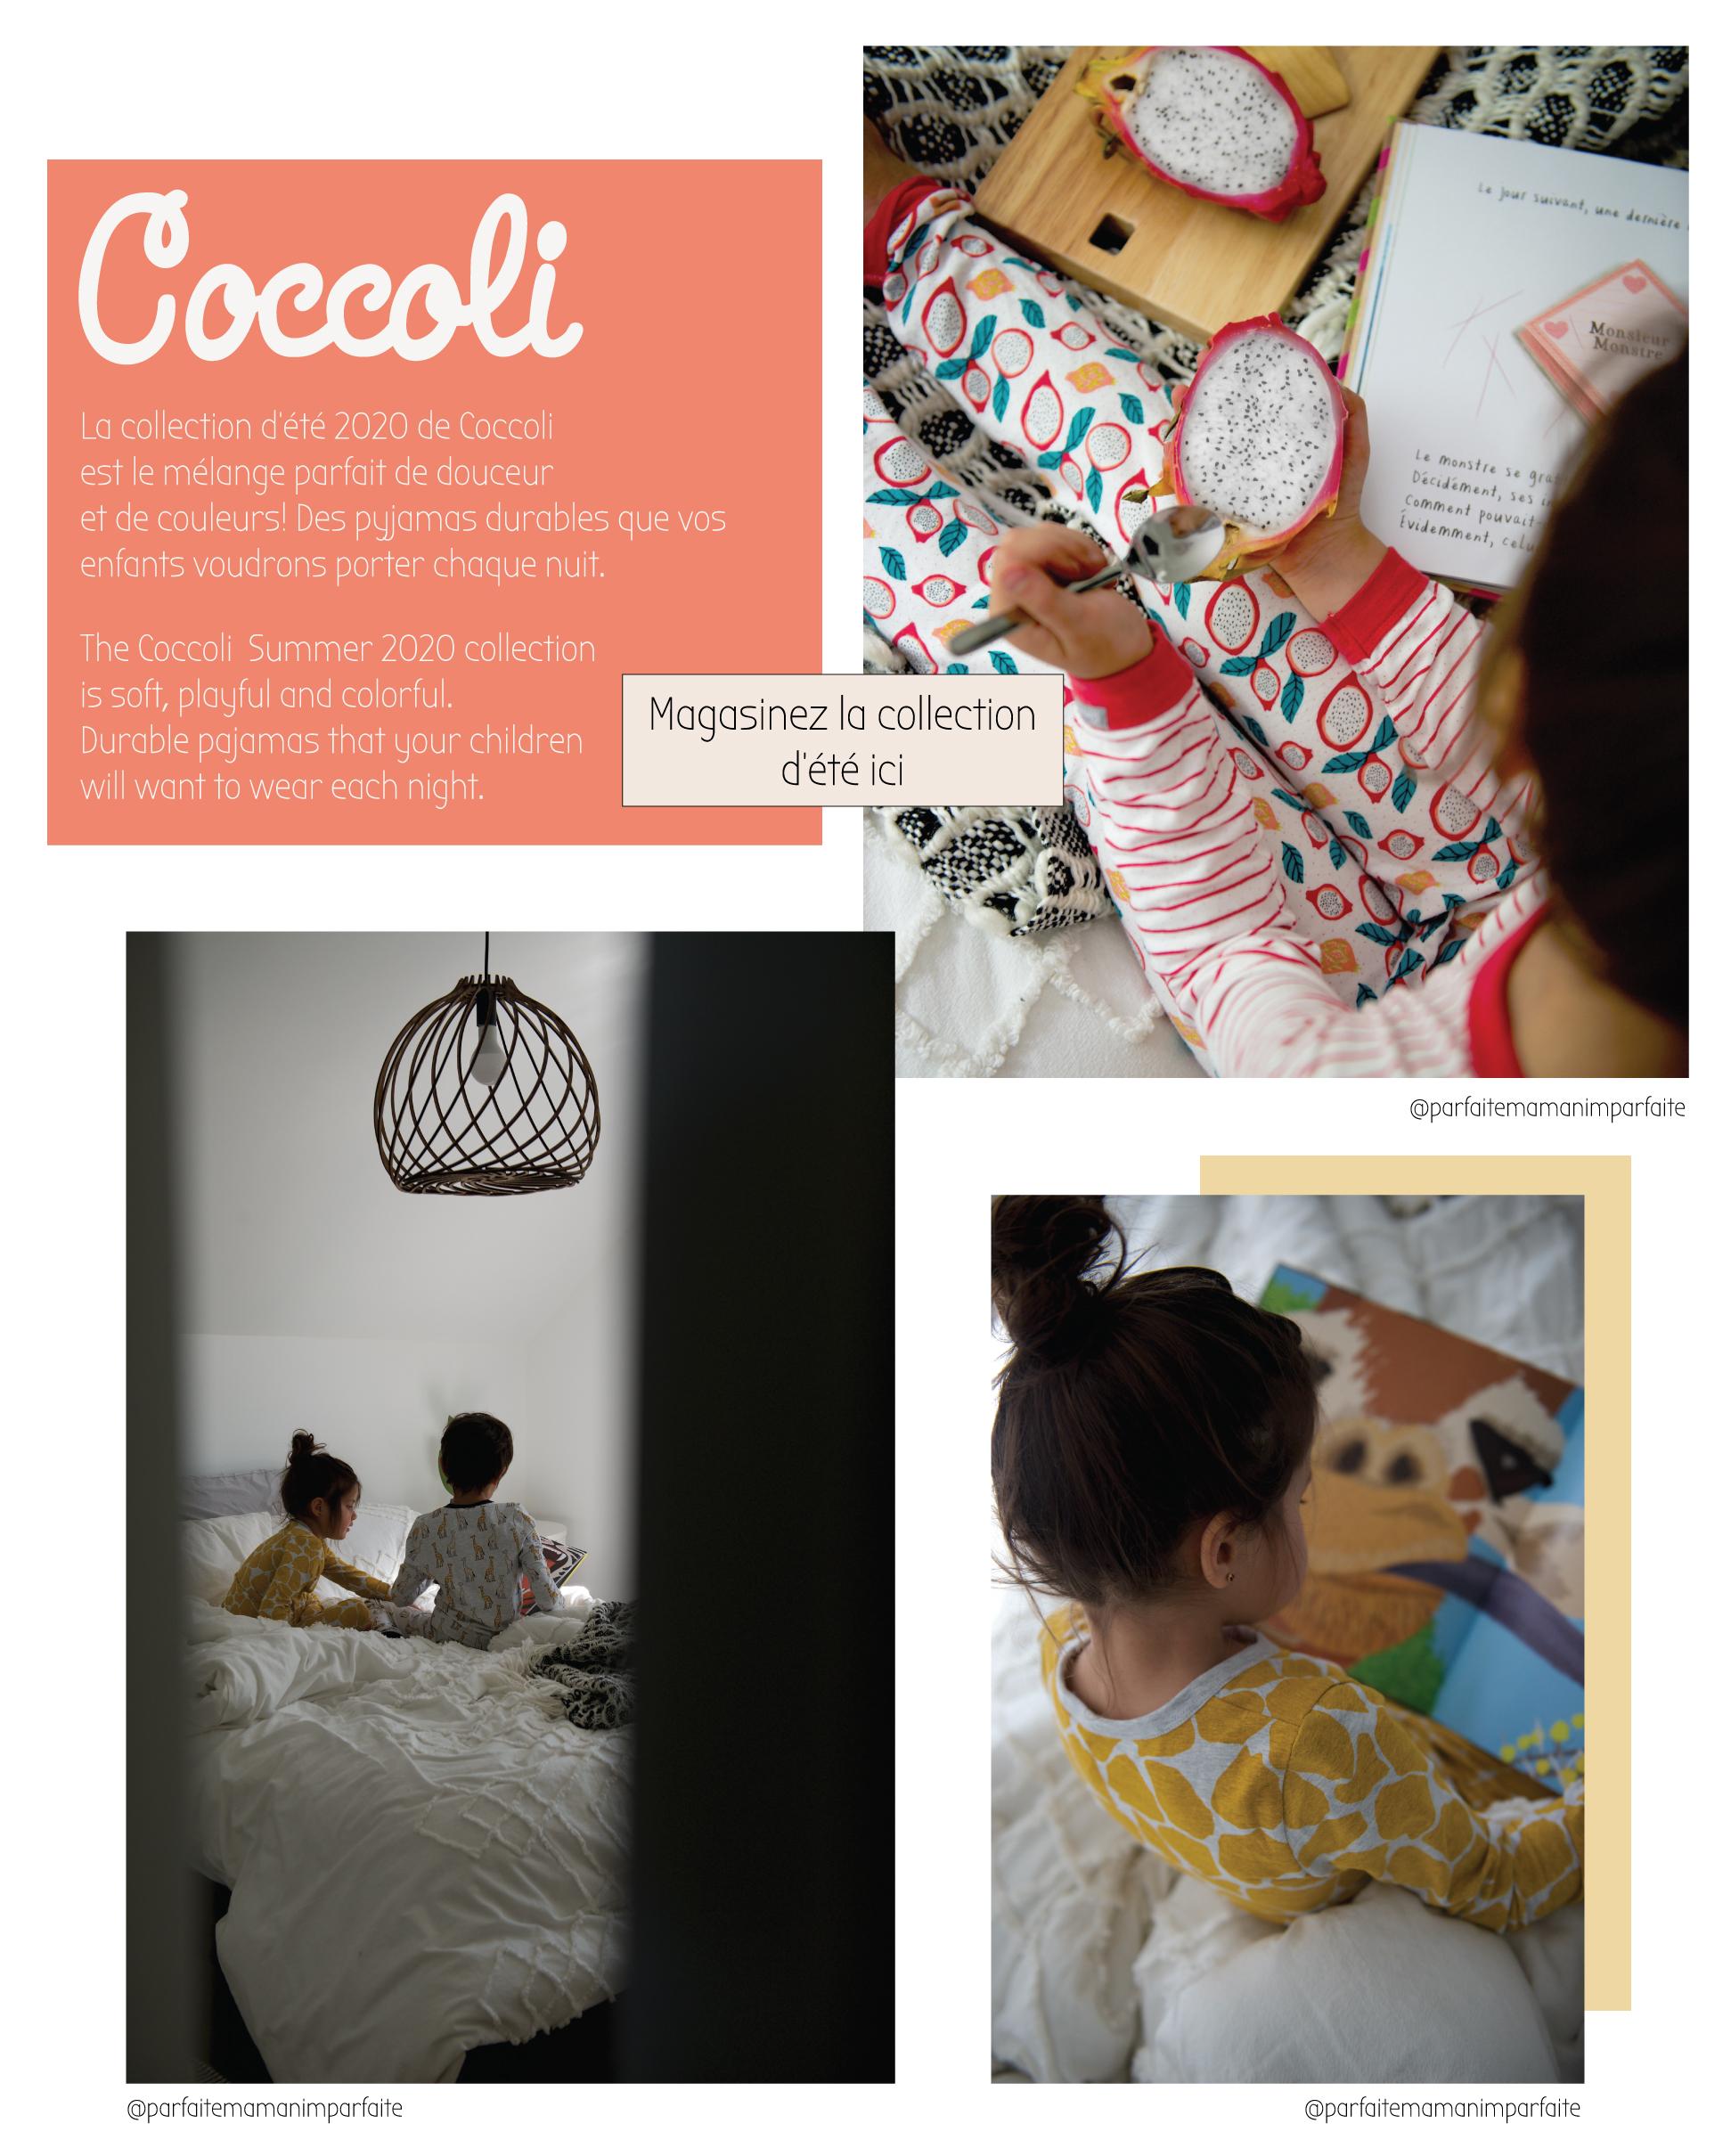 coccoli-2020-06-10.jpg